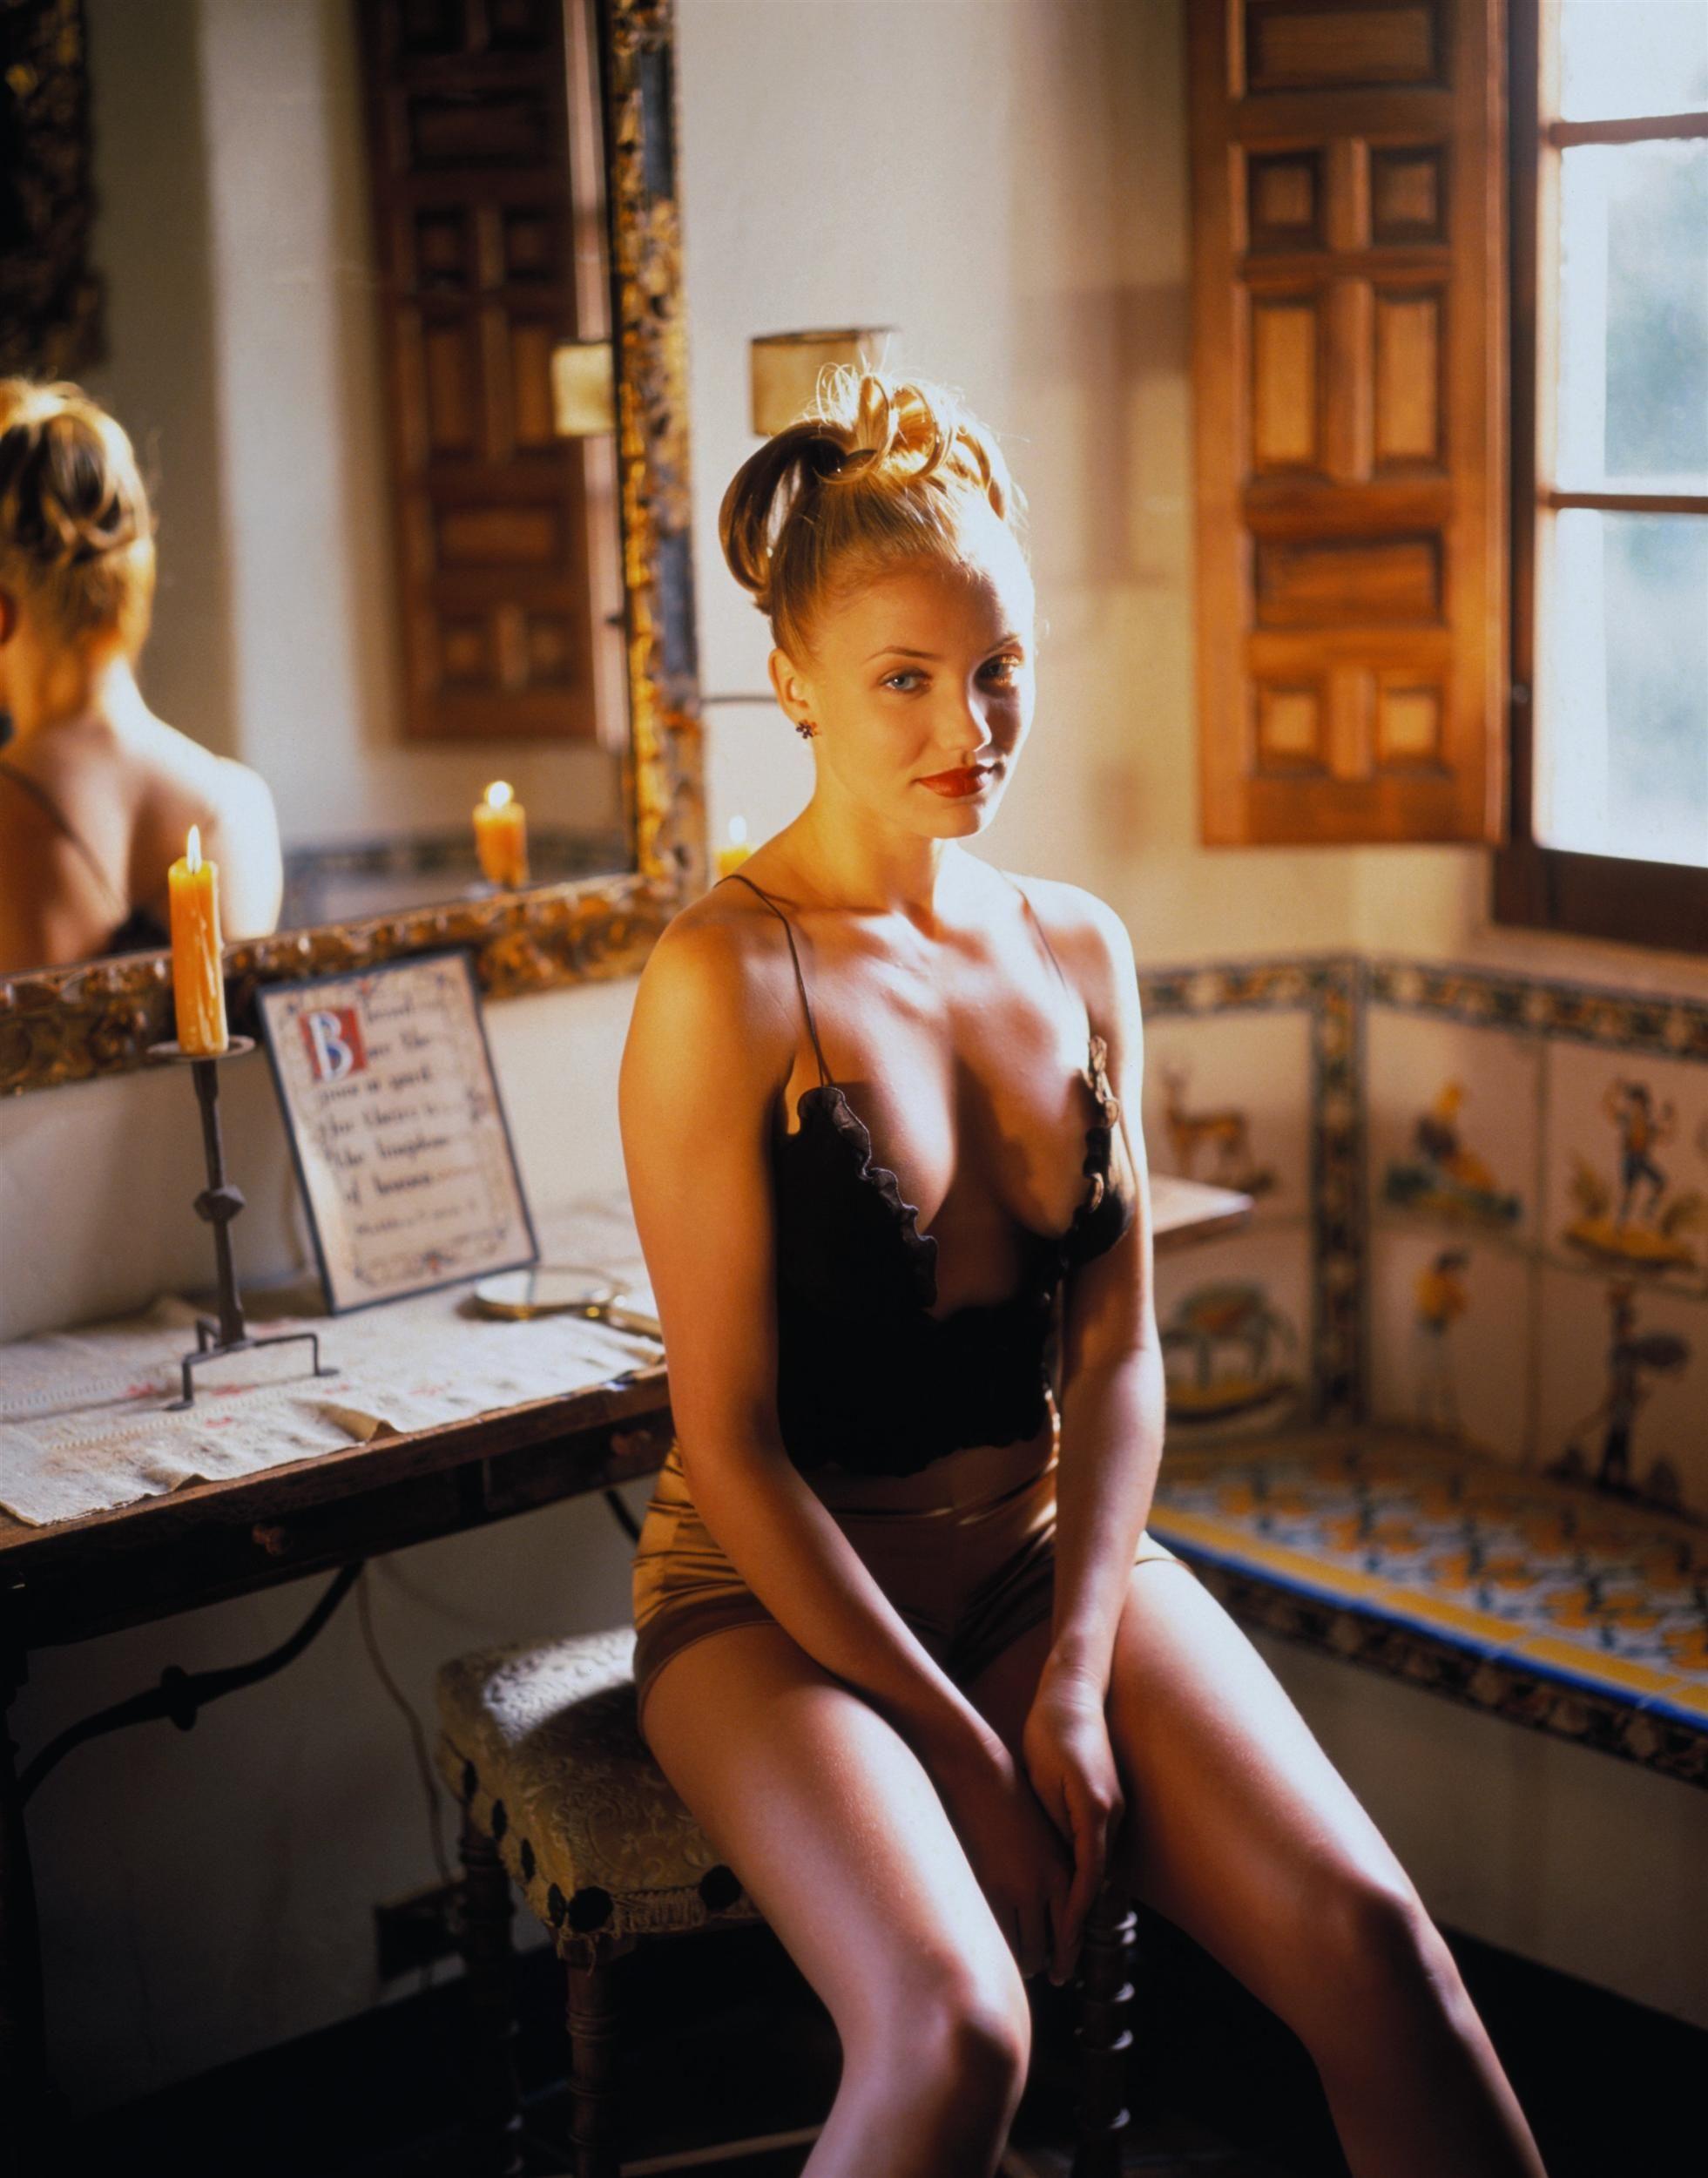 Stormi Maya Alvarado nudes (57 photos), Ass, Leaked, Boobs, legs 2020